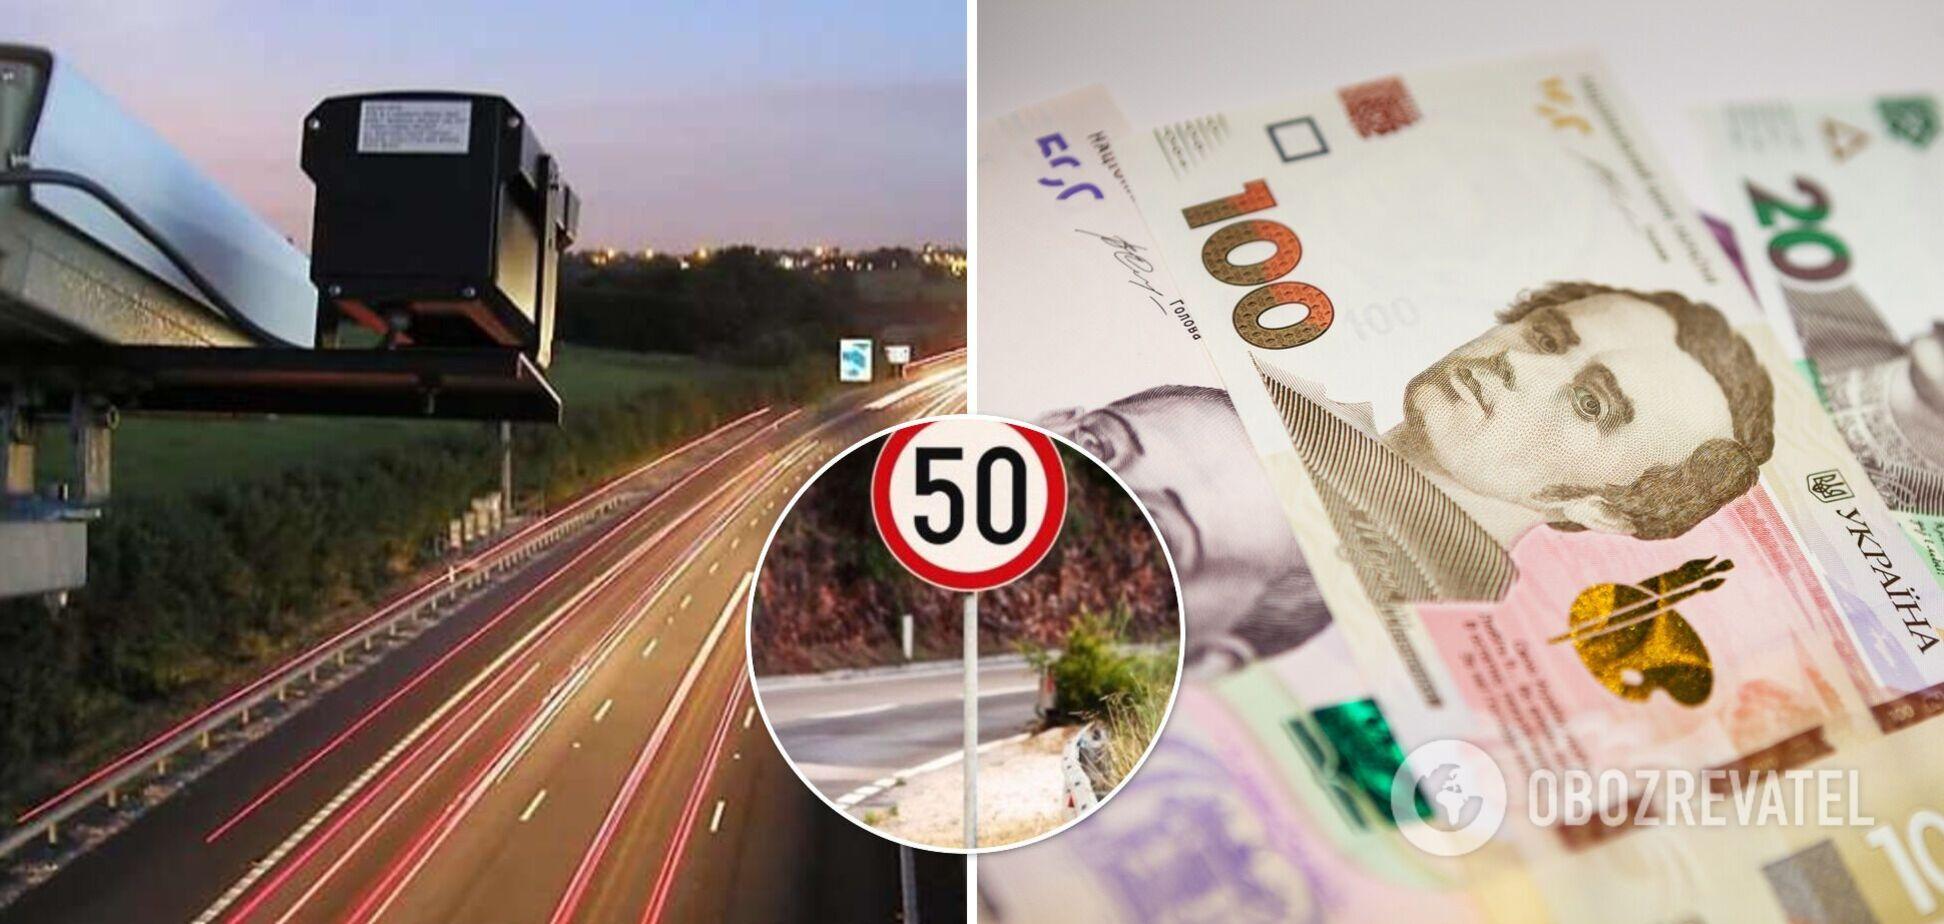 В Украине с момента запуска видеофиксации скорости водители заплатили 376,6 млн грн